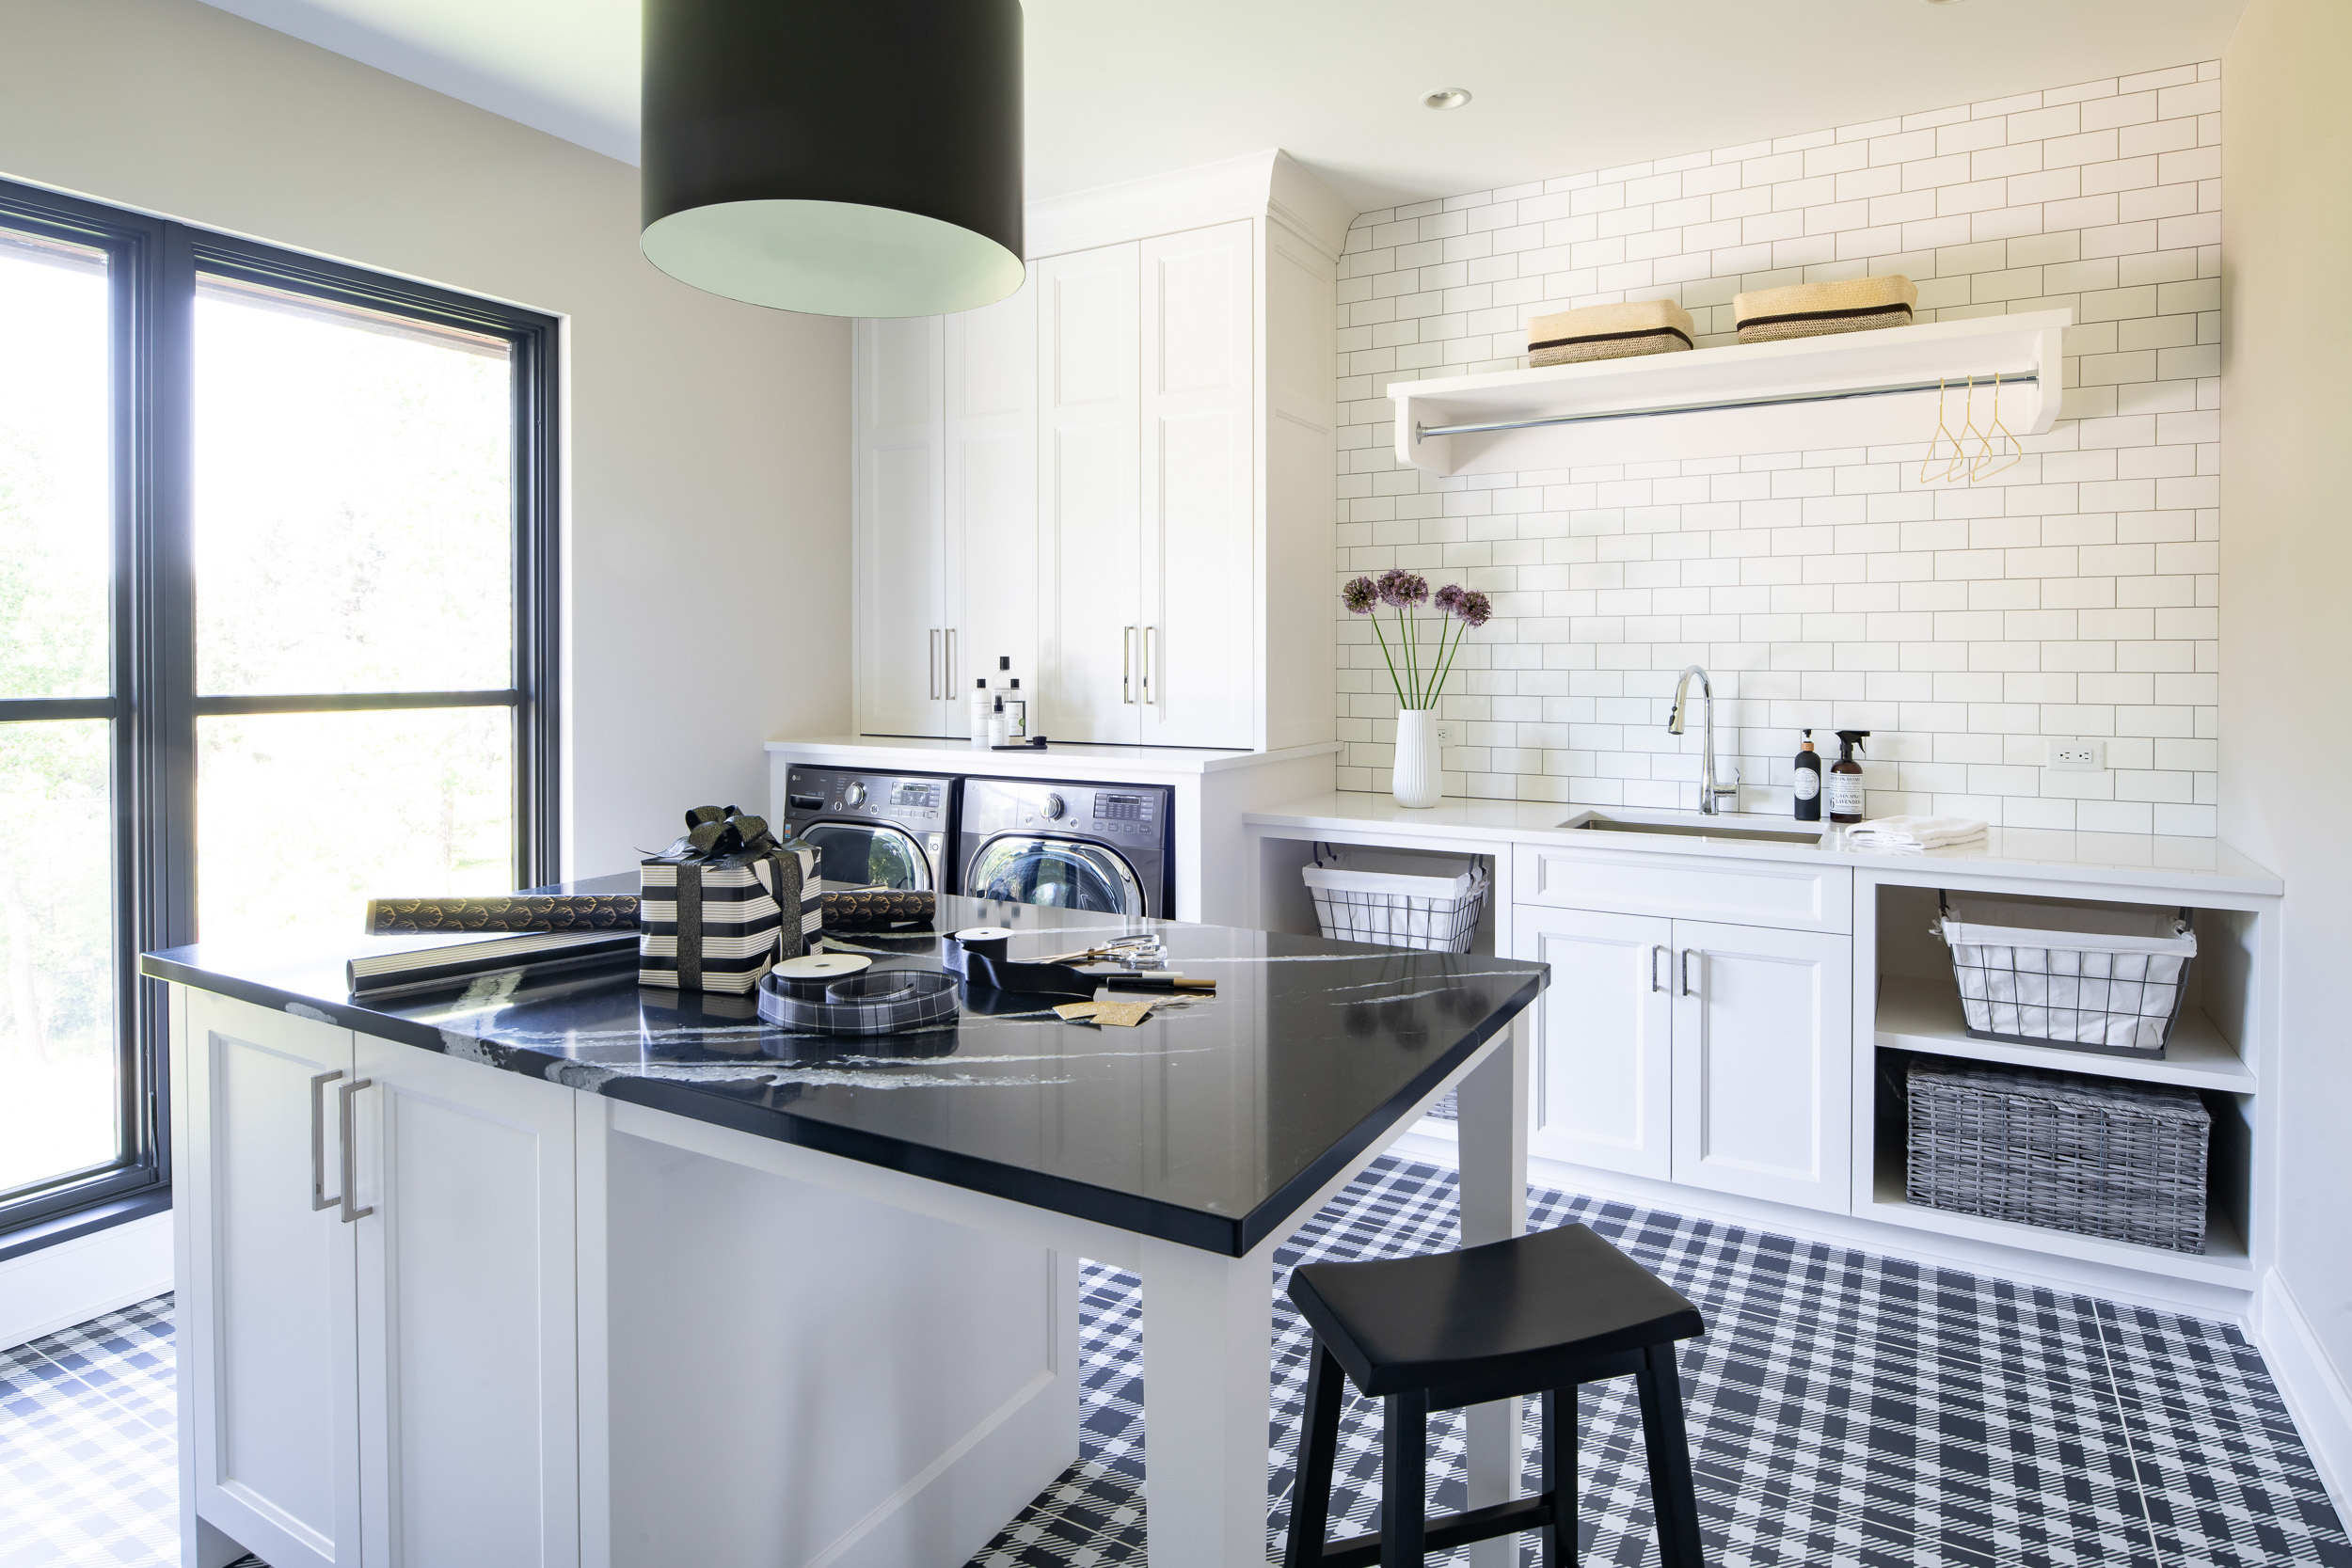 Modern Rustic - Laundry Room